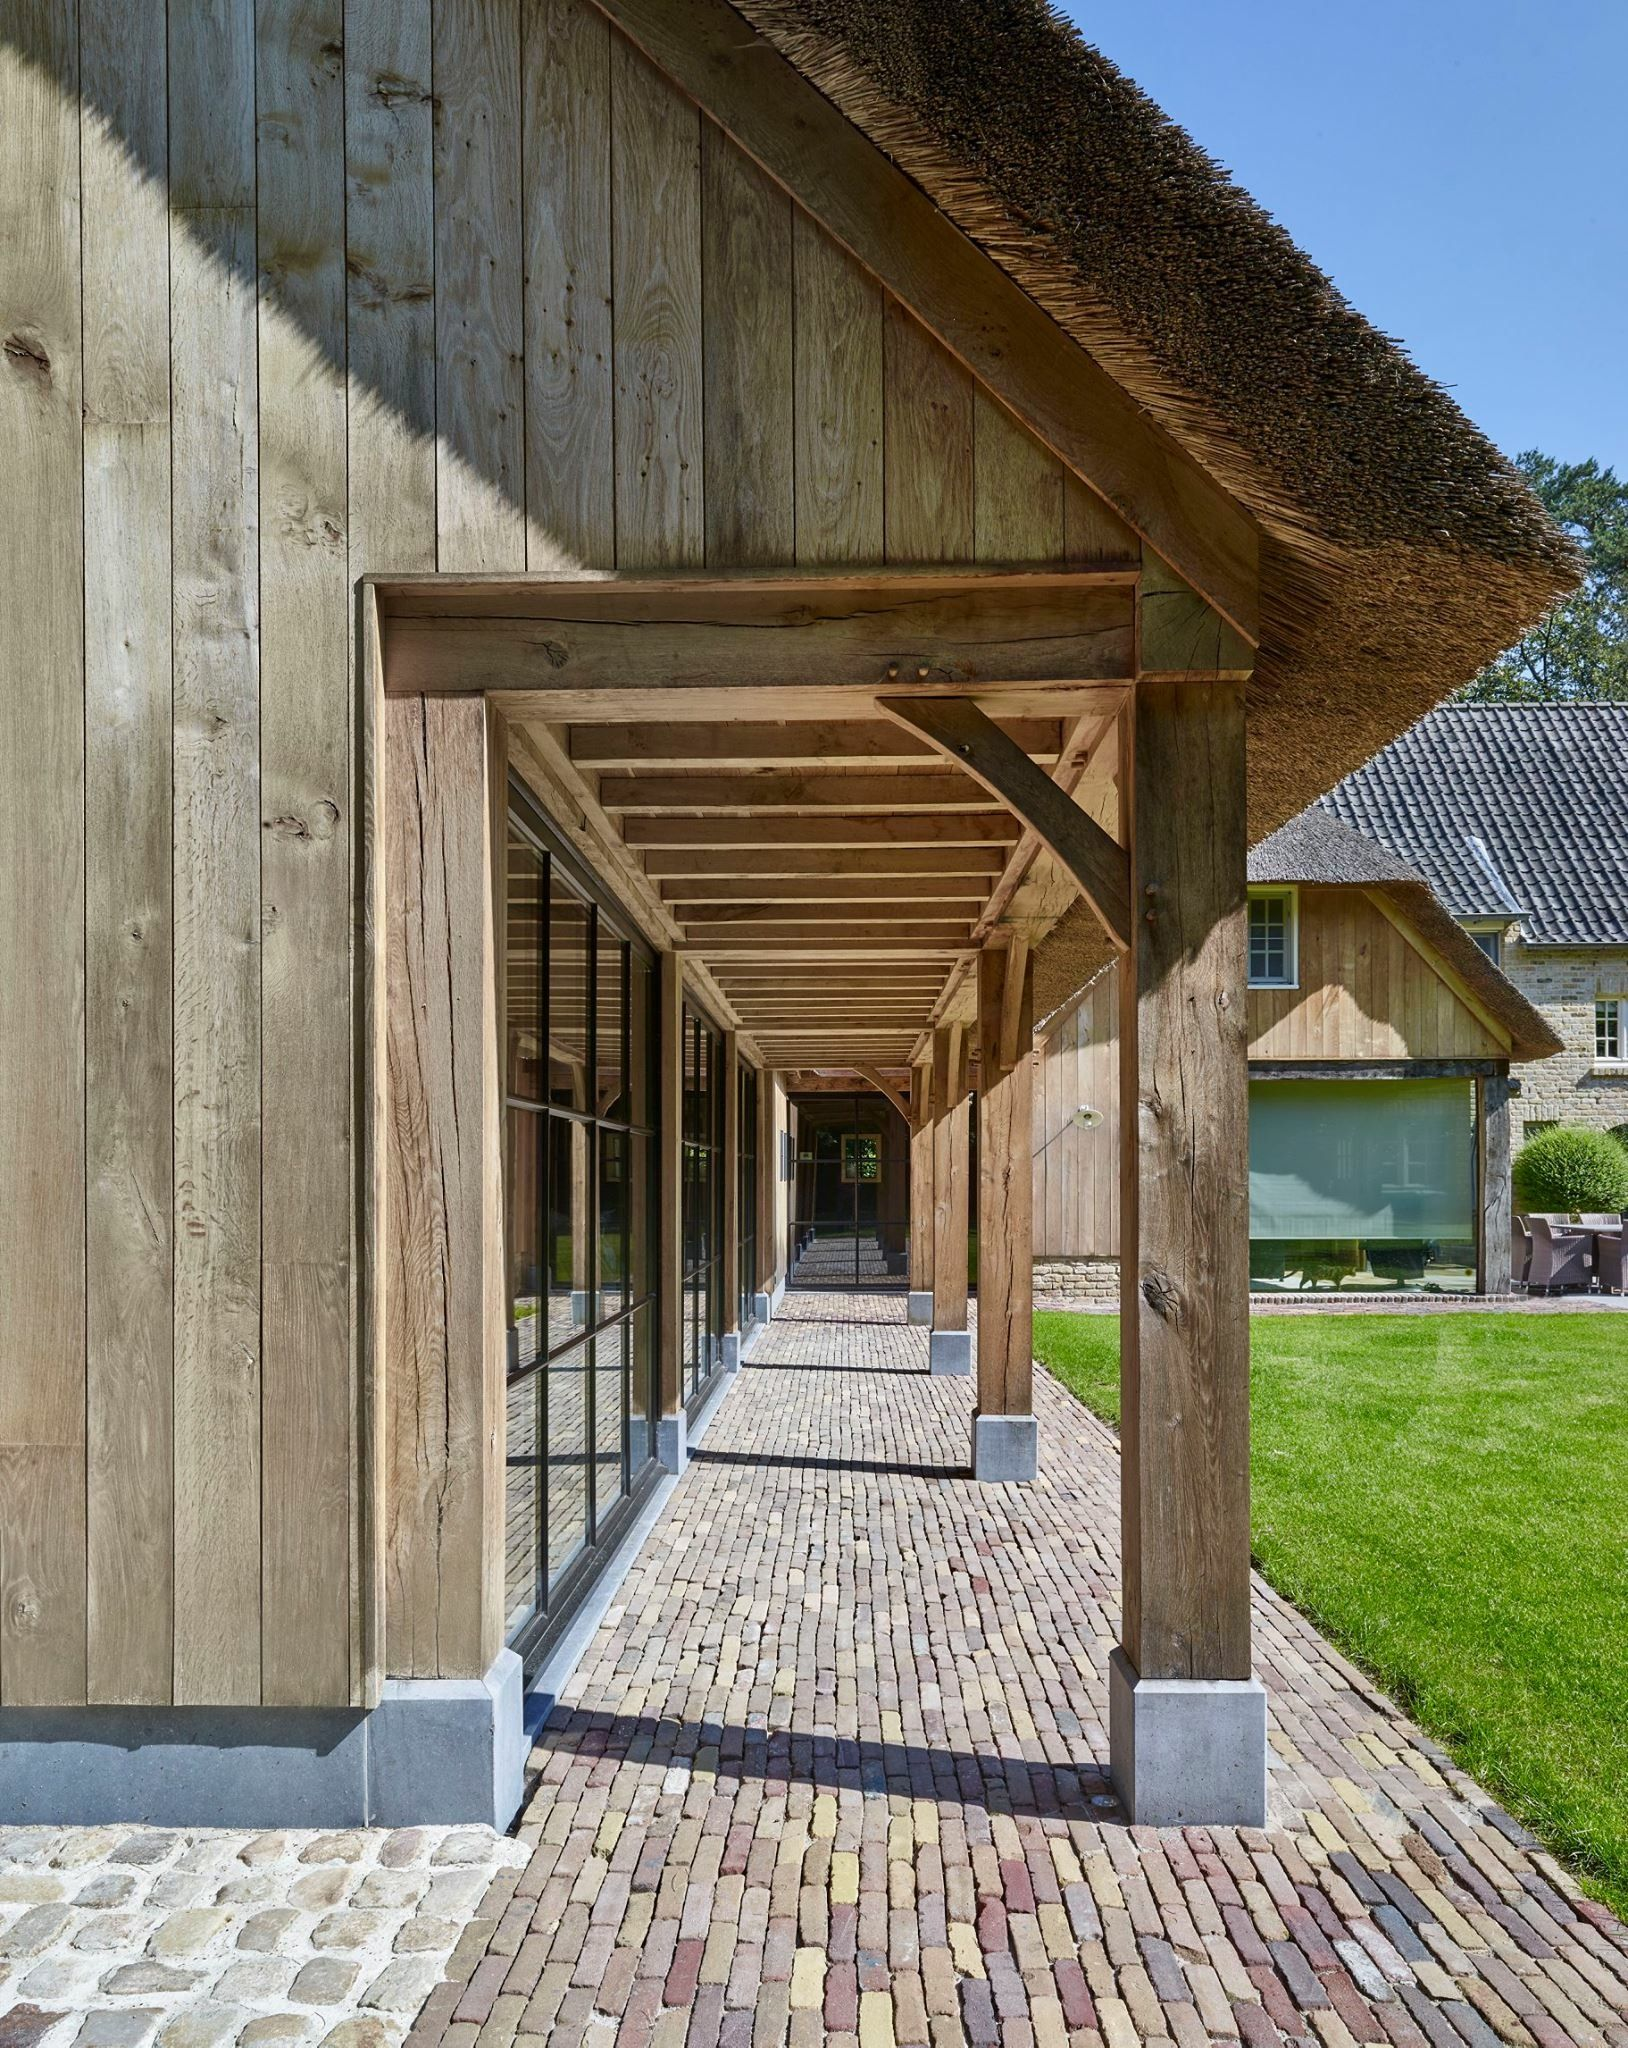 Pin von Twoja Stara auf Interesujące, inspirujące, architektura ...